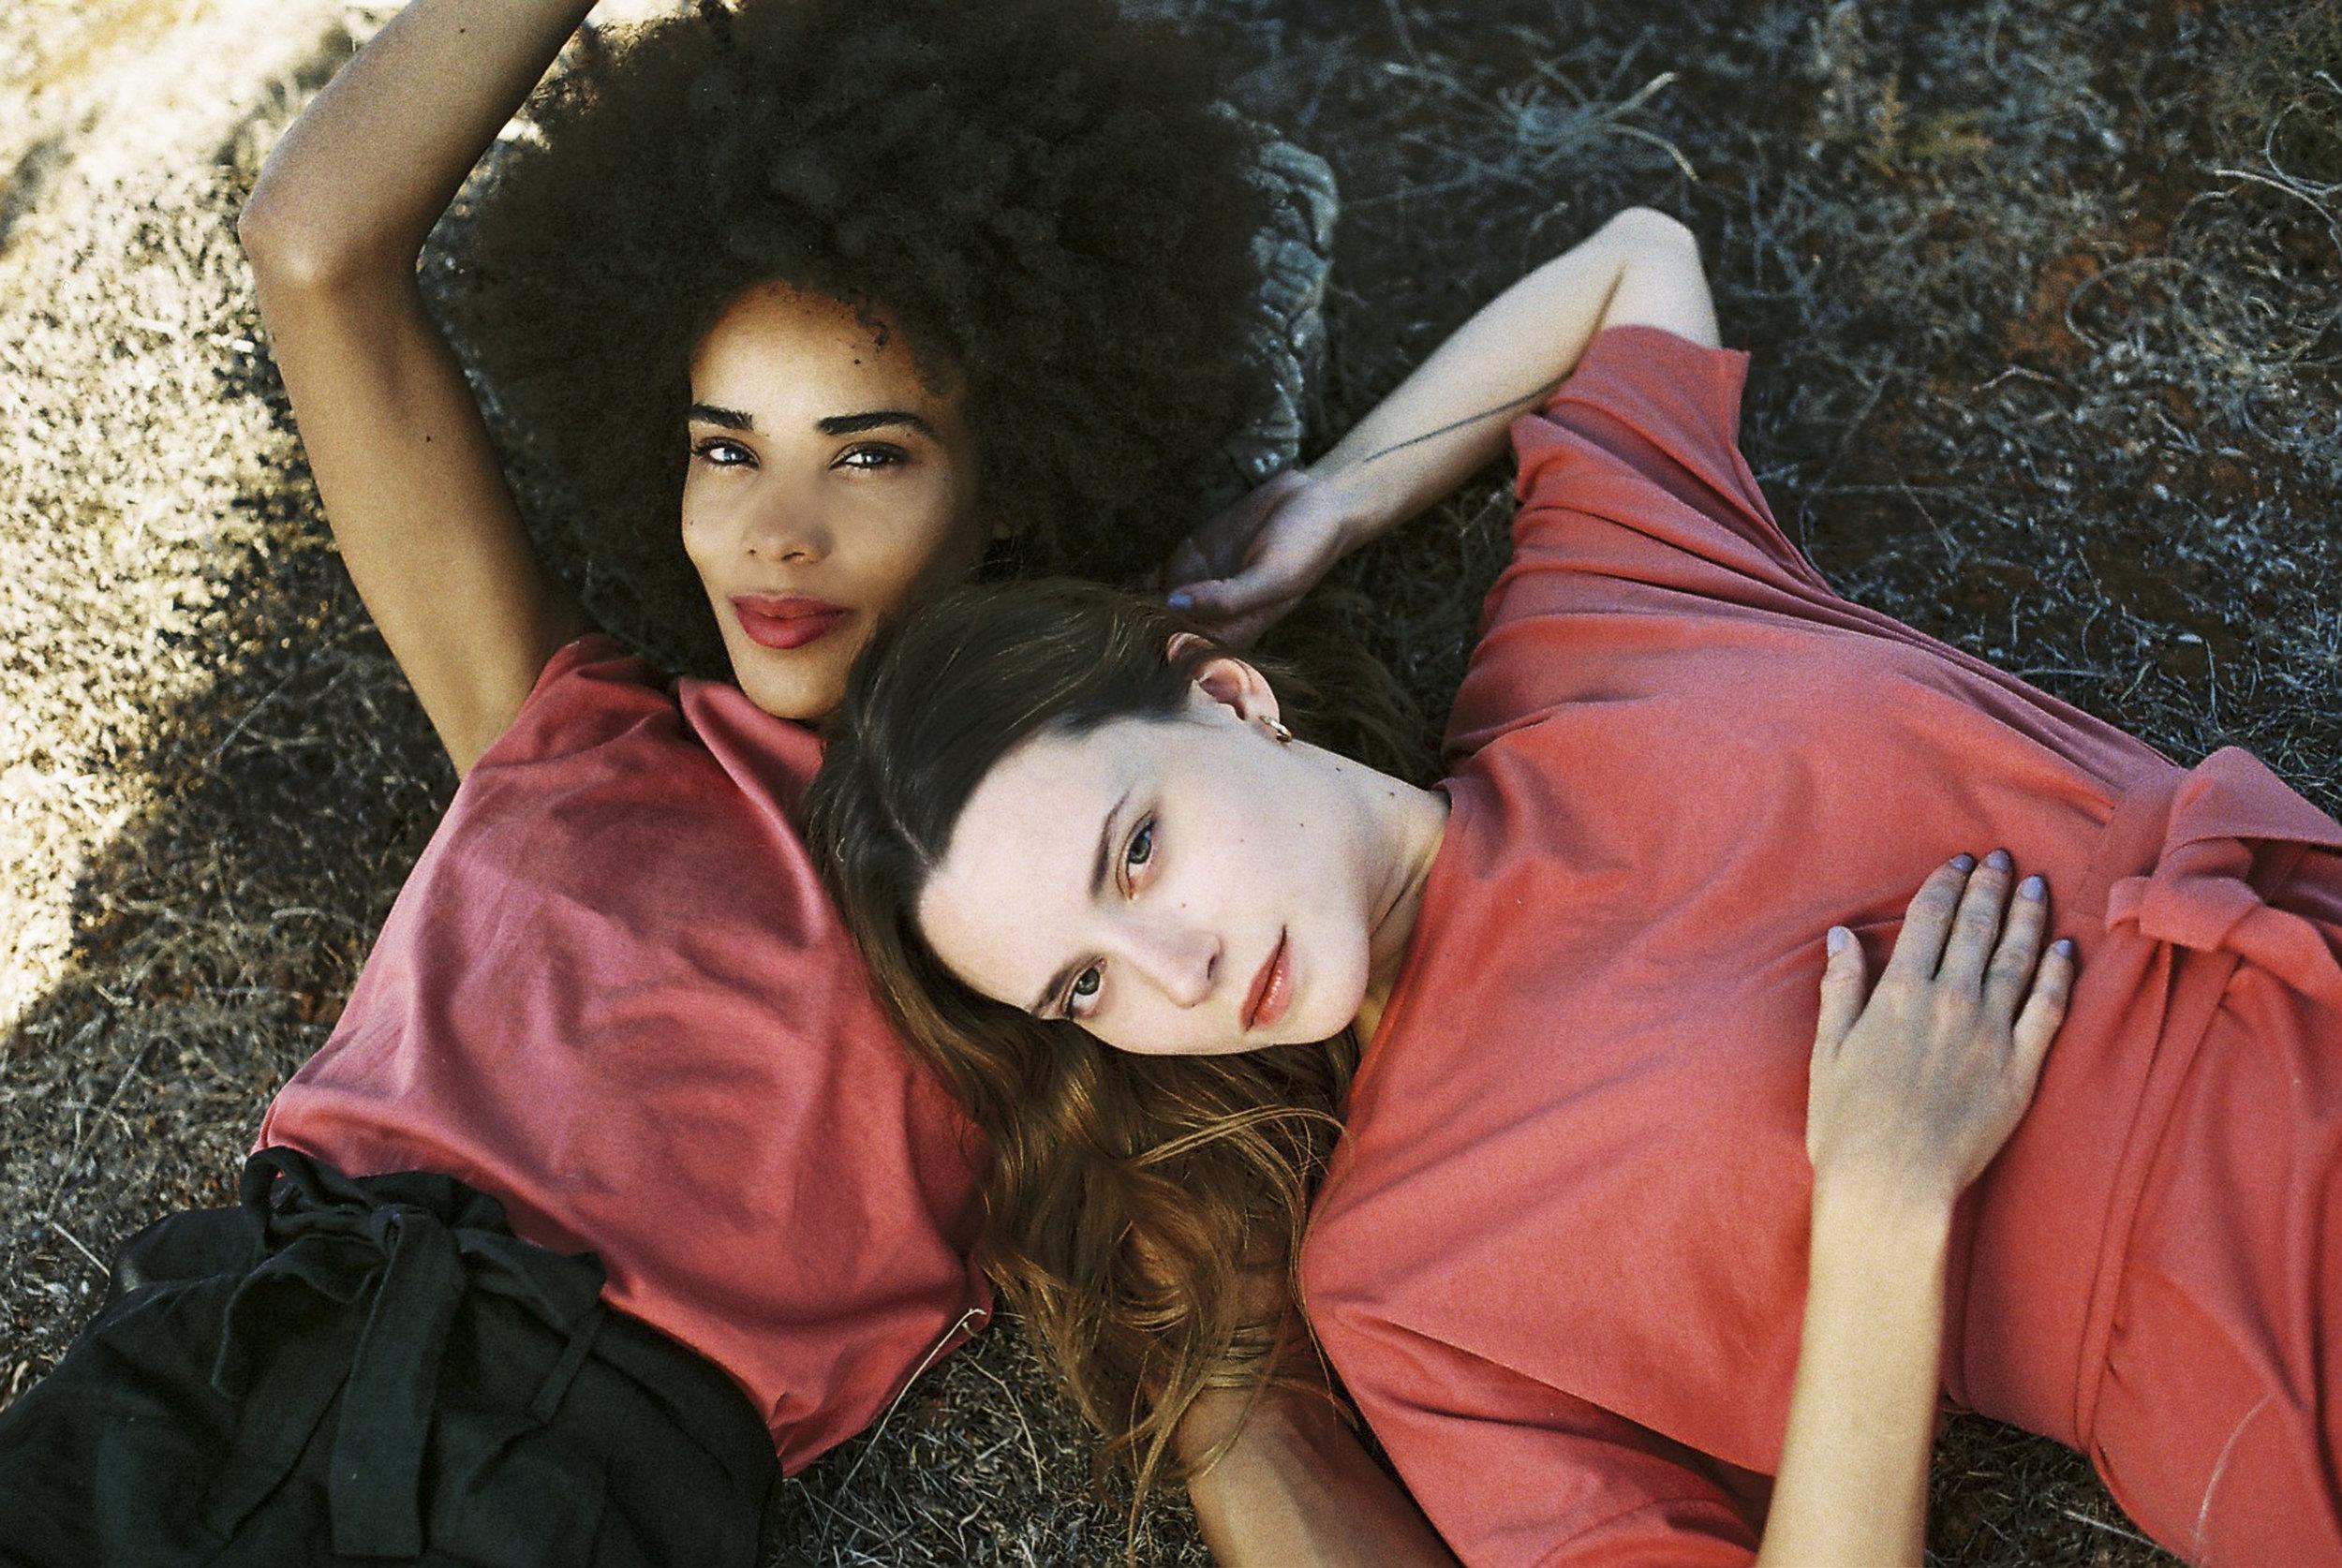 JF_SS18_Campaign_Olivia_Shirt_dusty-red_Mara_Shorts_black_Lili_Dress_dusty-red_1.jpg